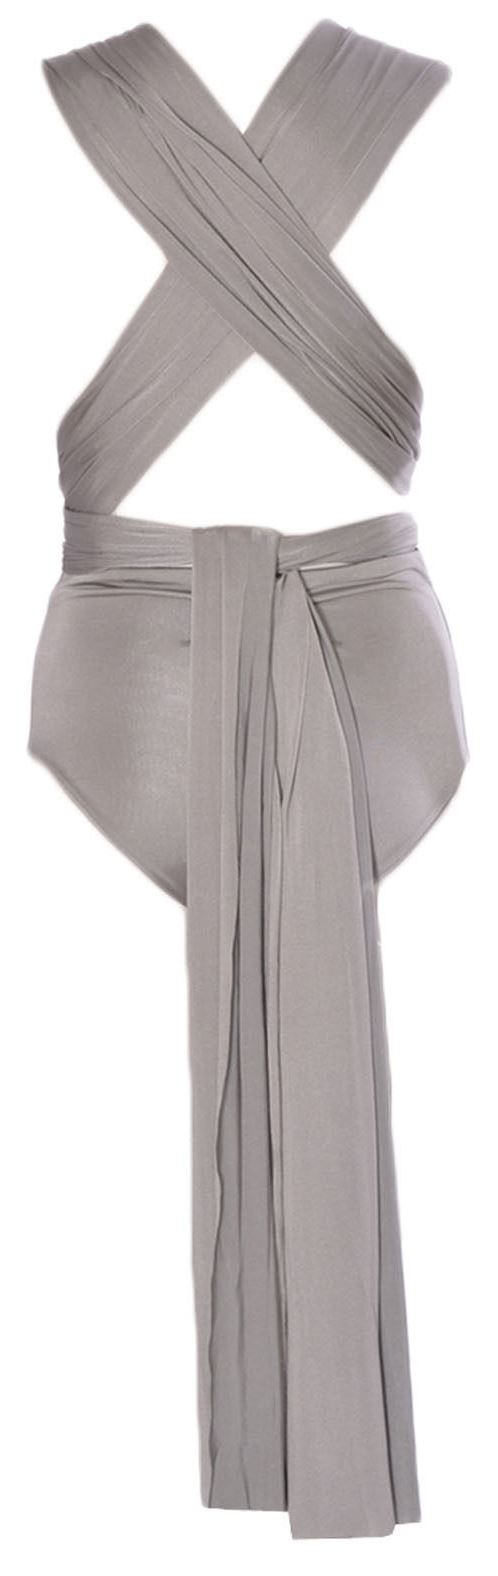 New Womens Multi Way Slinky Wrap Over Bodysuit Leotard Top